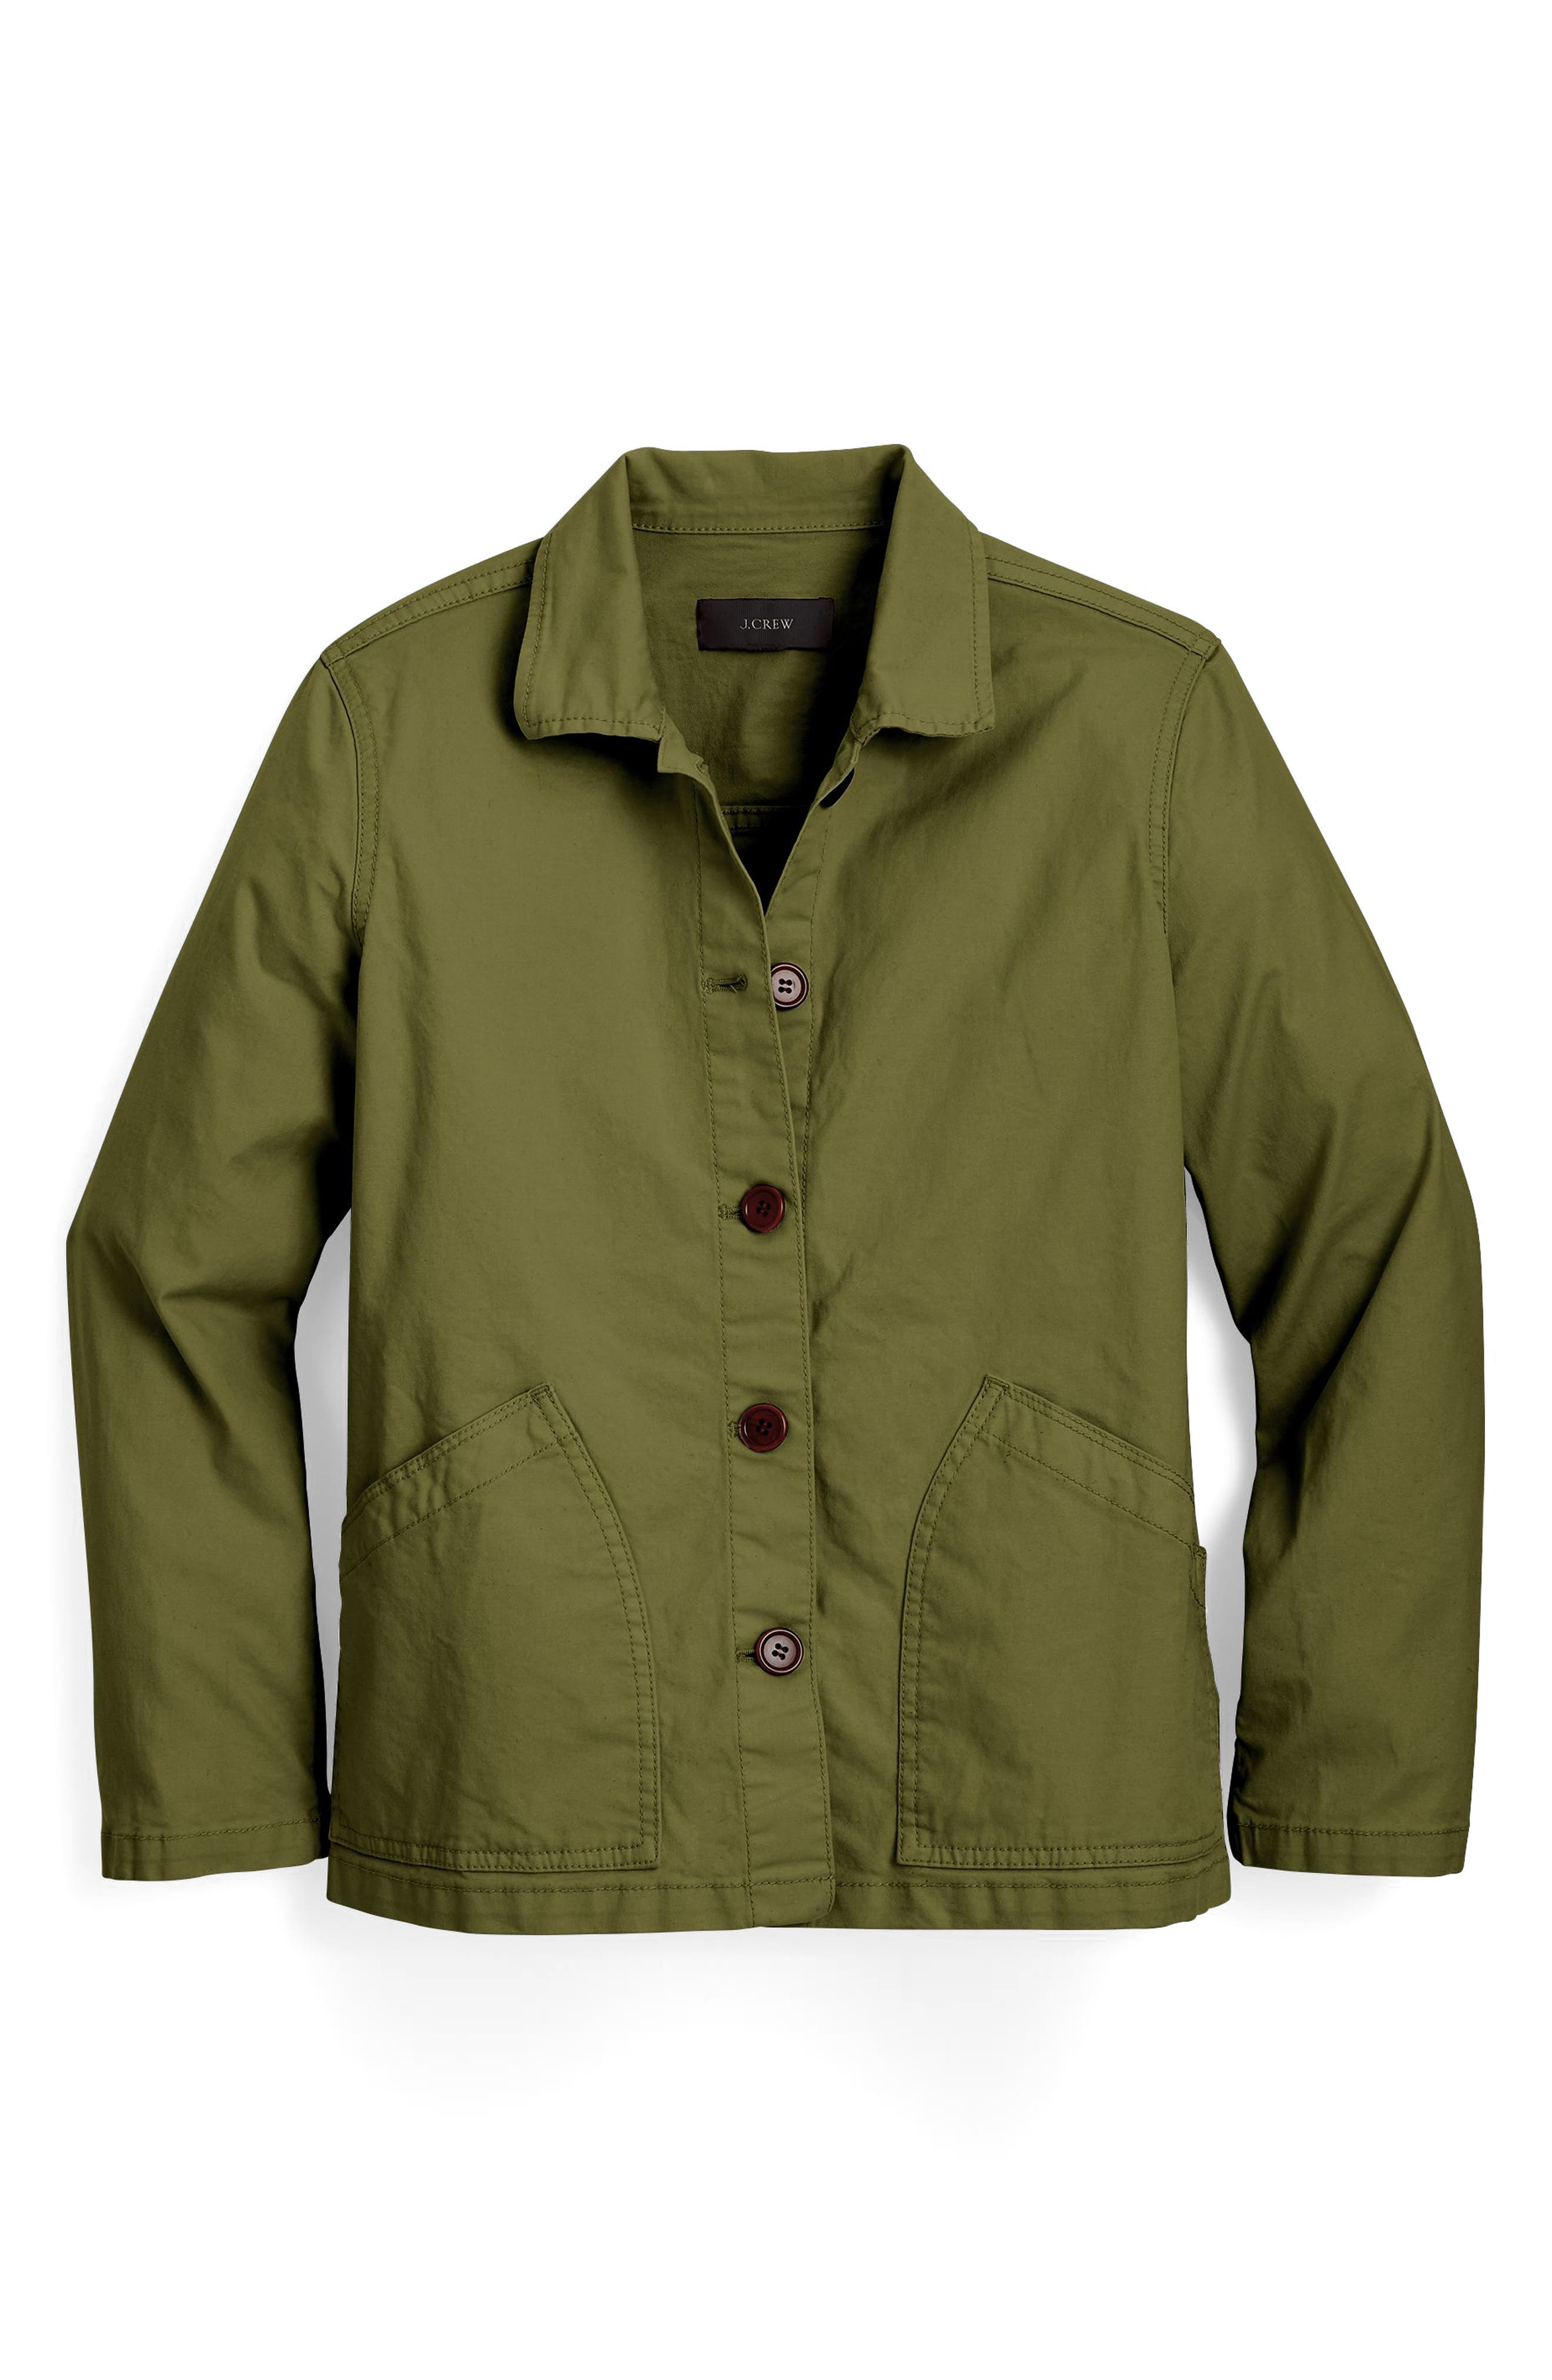 Main Image - J.Crew Garment Dyed Swing Jacket